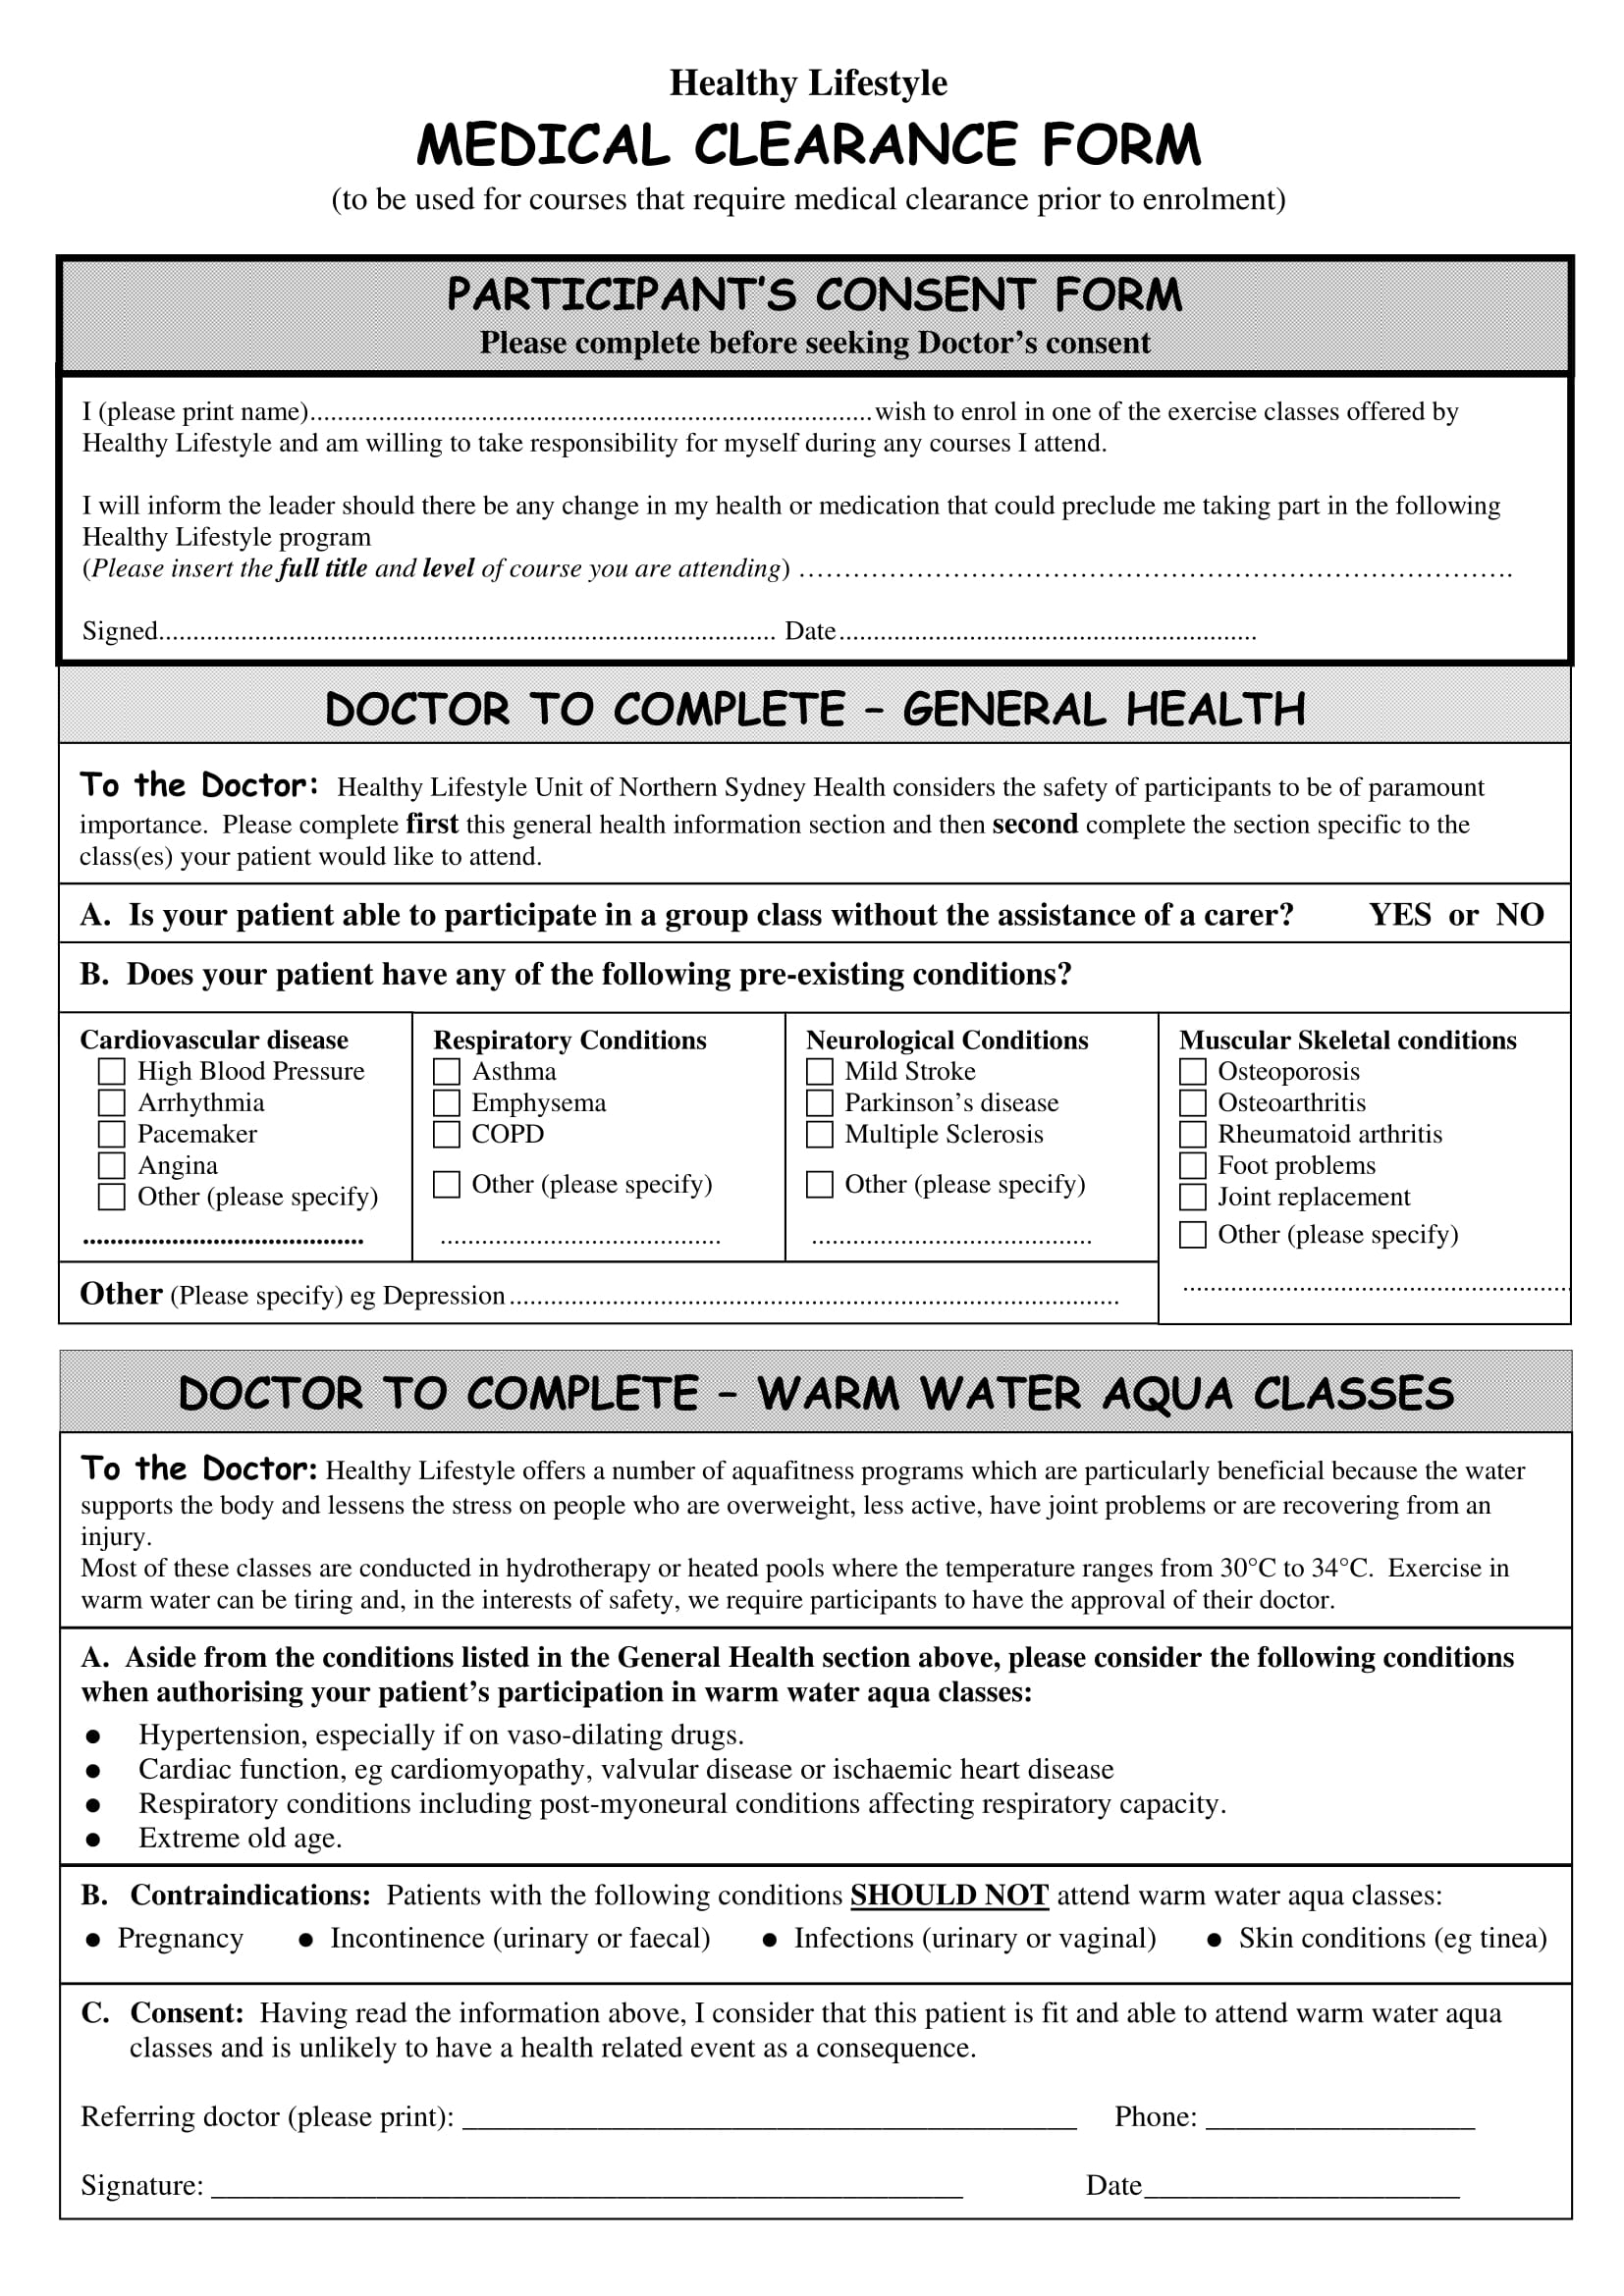 enrolment medical clearance form 1